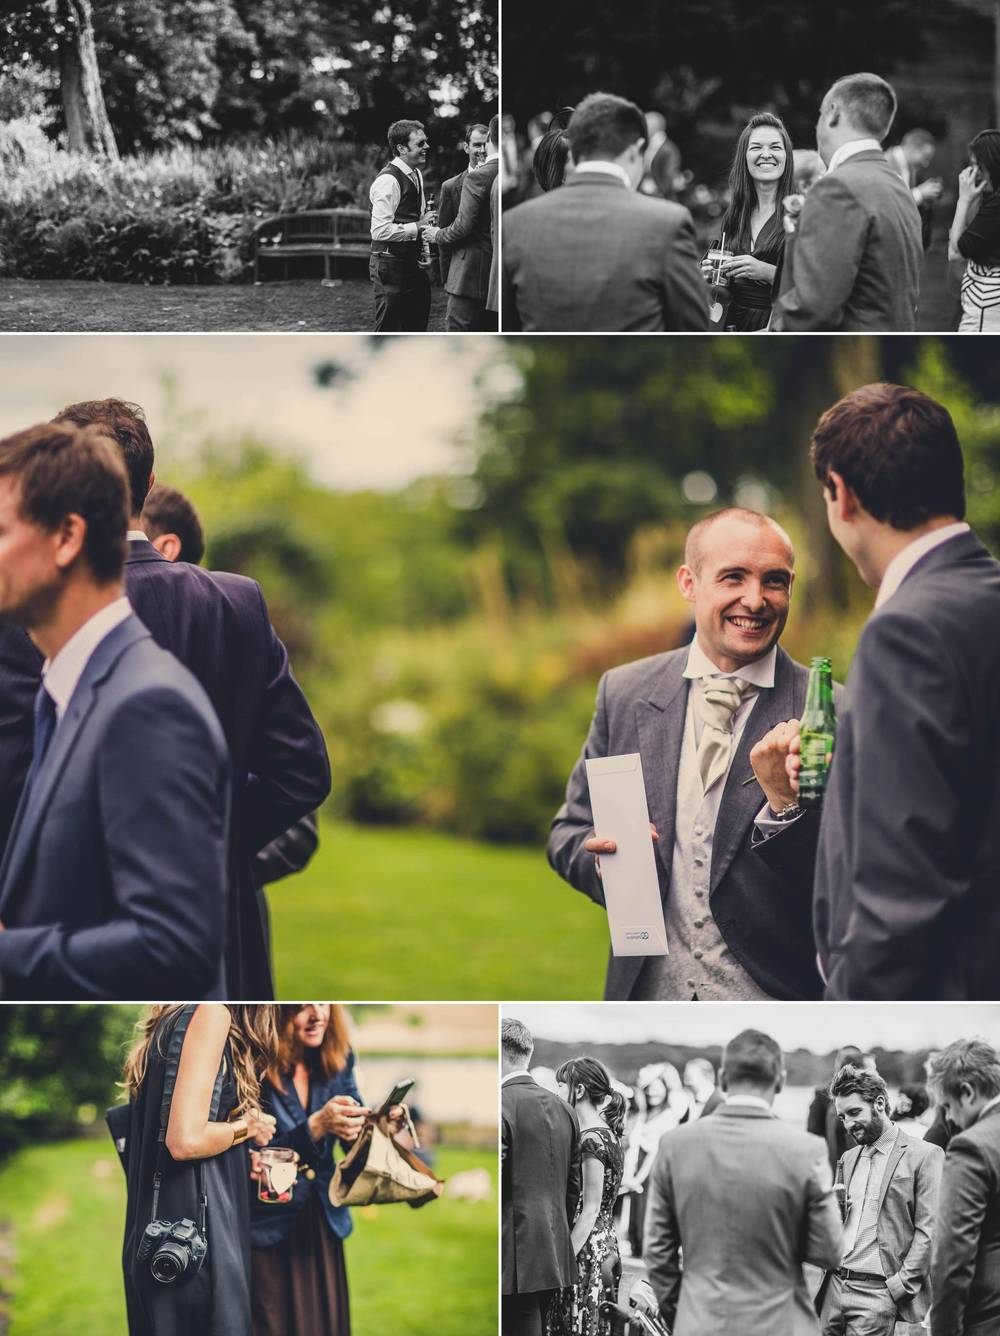 the-ashes-wedding-photographer 12.jpg